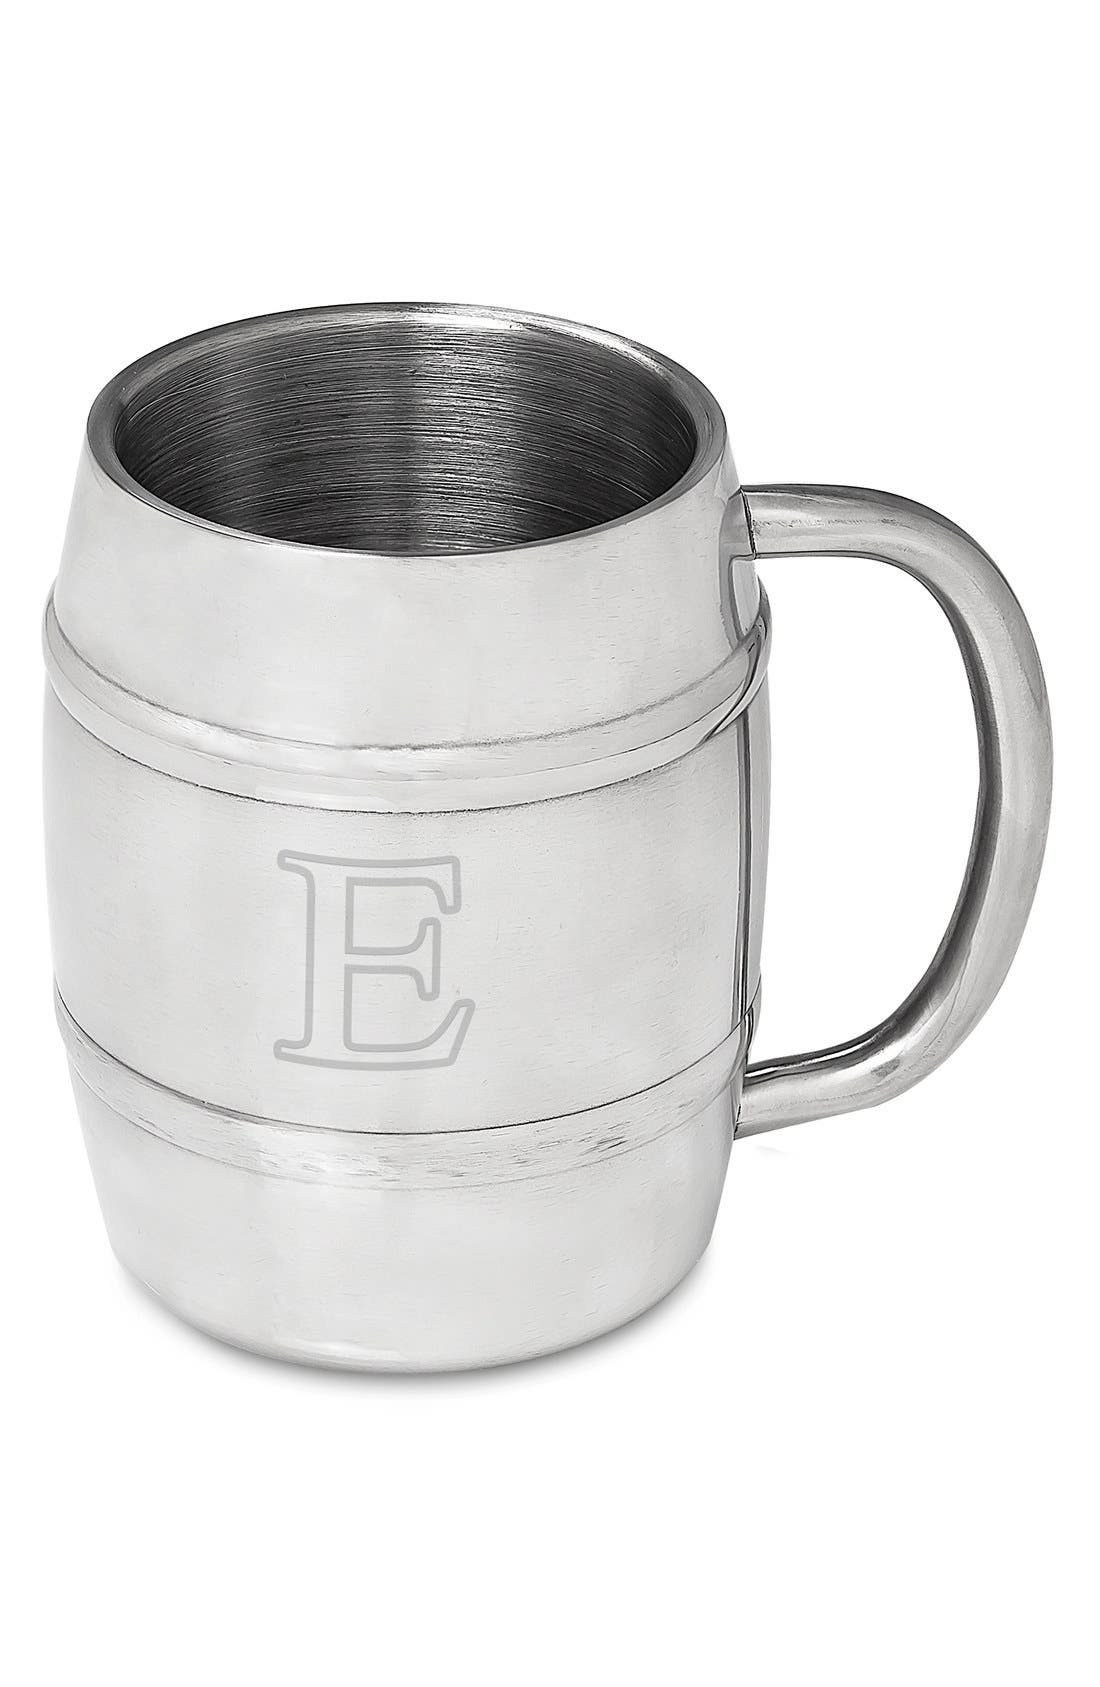 Monogram Stainless Steel Keg Mug,                             Main thumbnail 7, color,